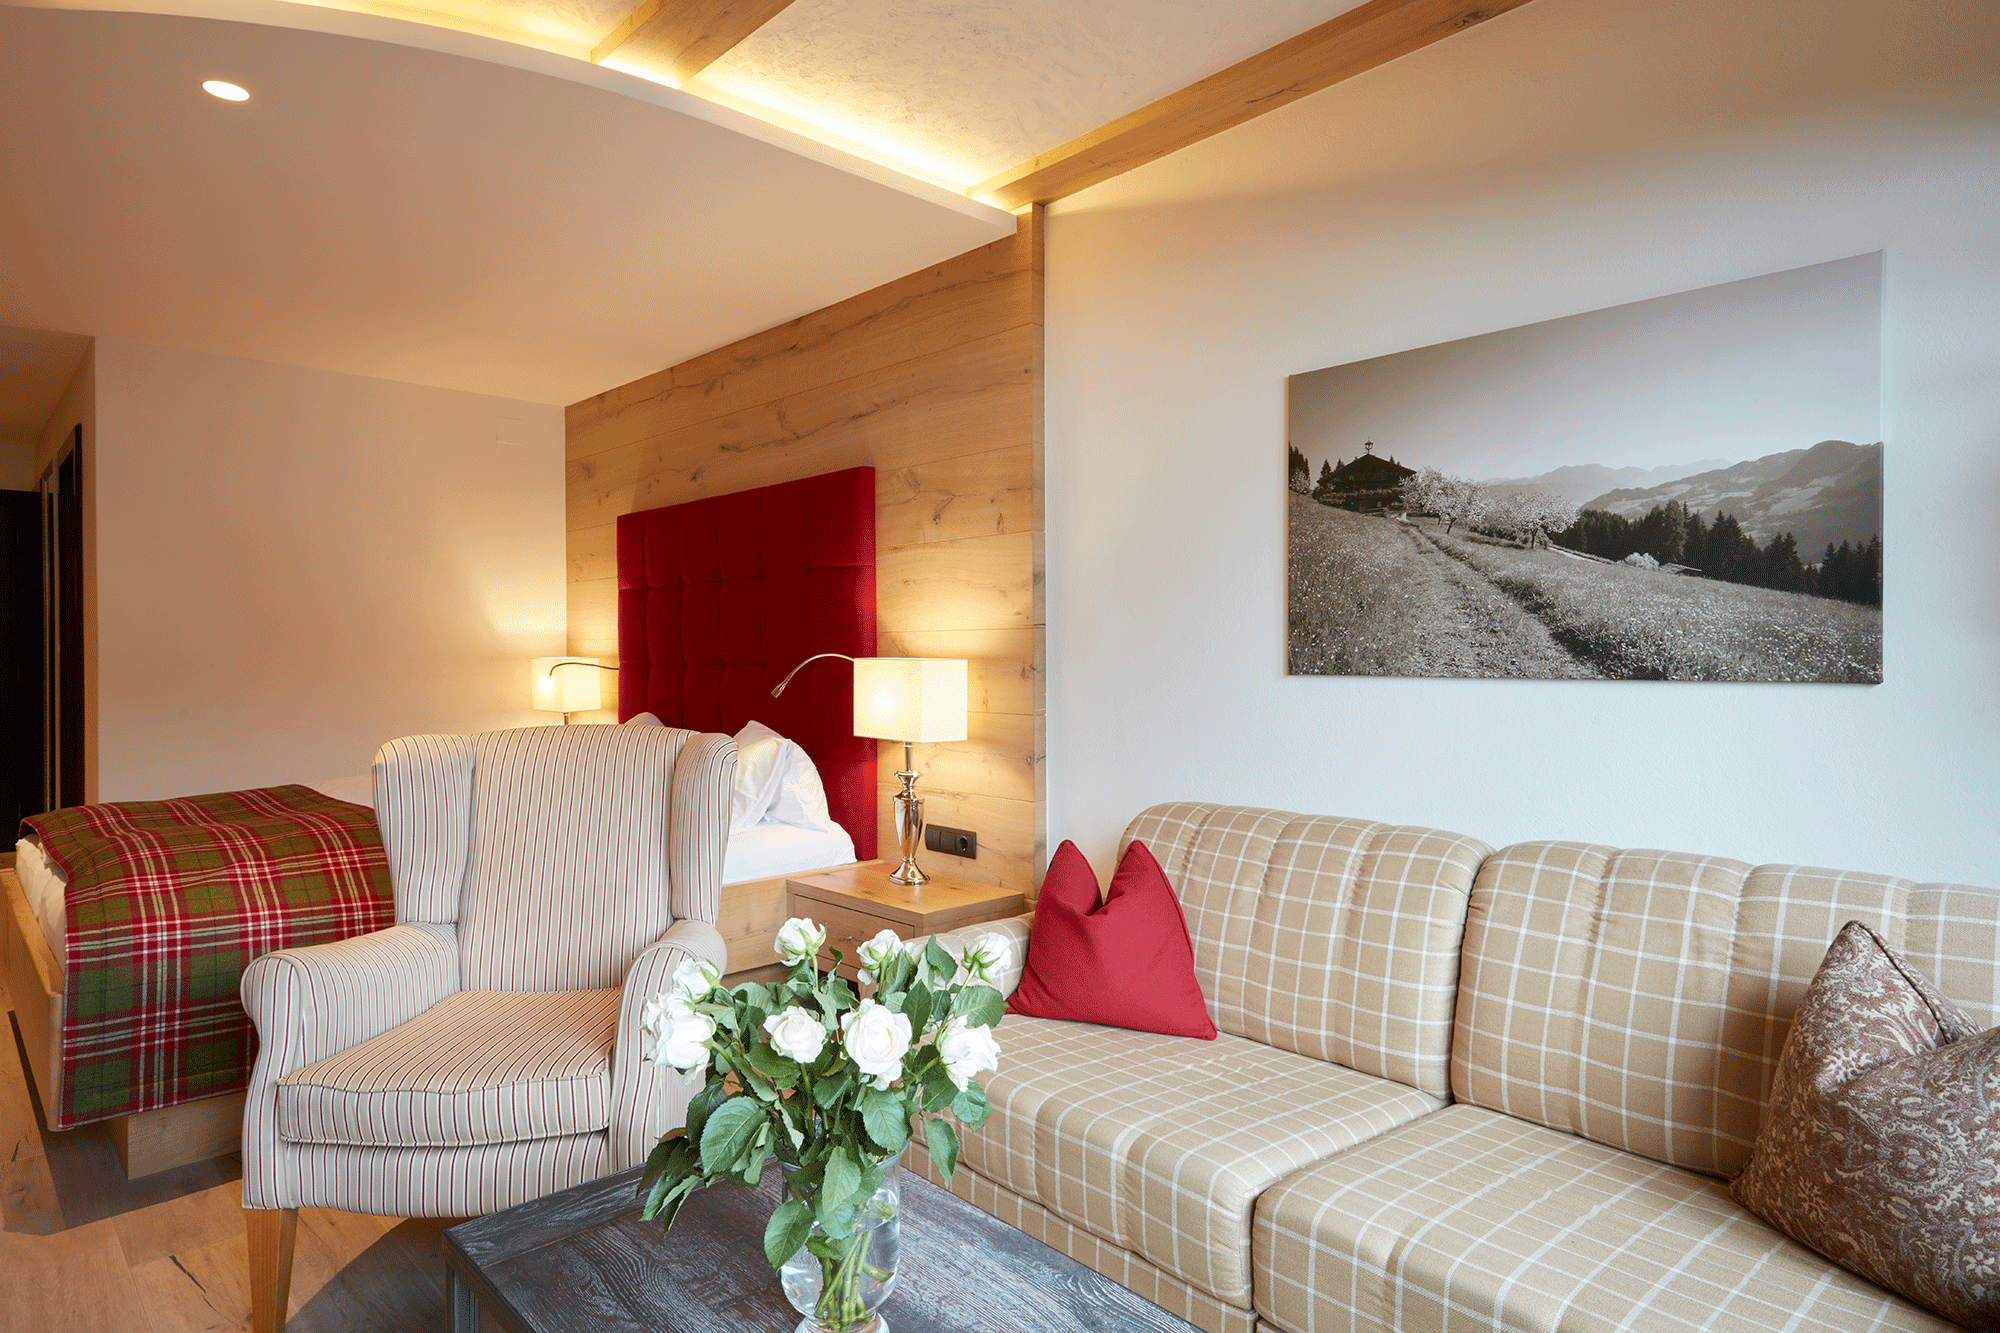 Wohnkomfortzimmer Romantik Sitzecke Hotel Alpbachtal Tirol